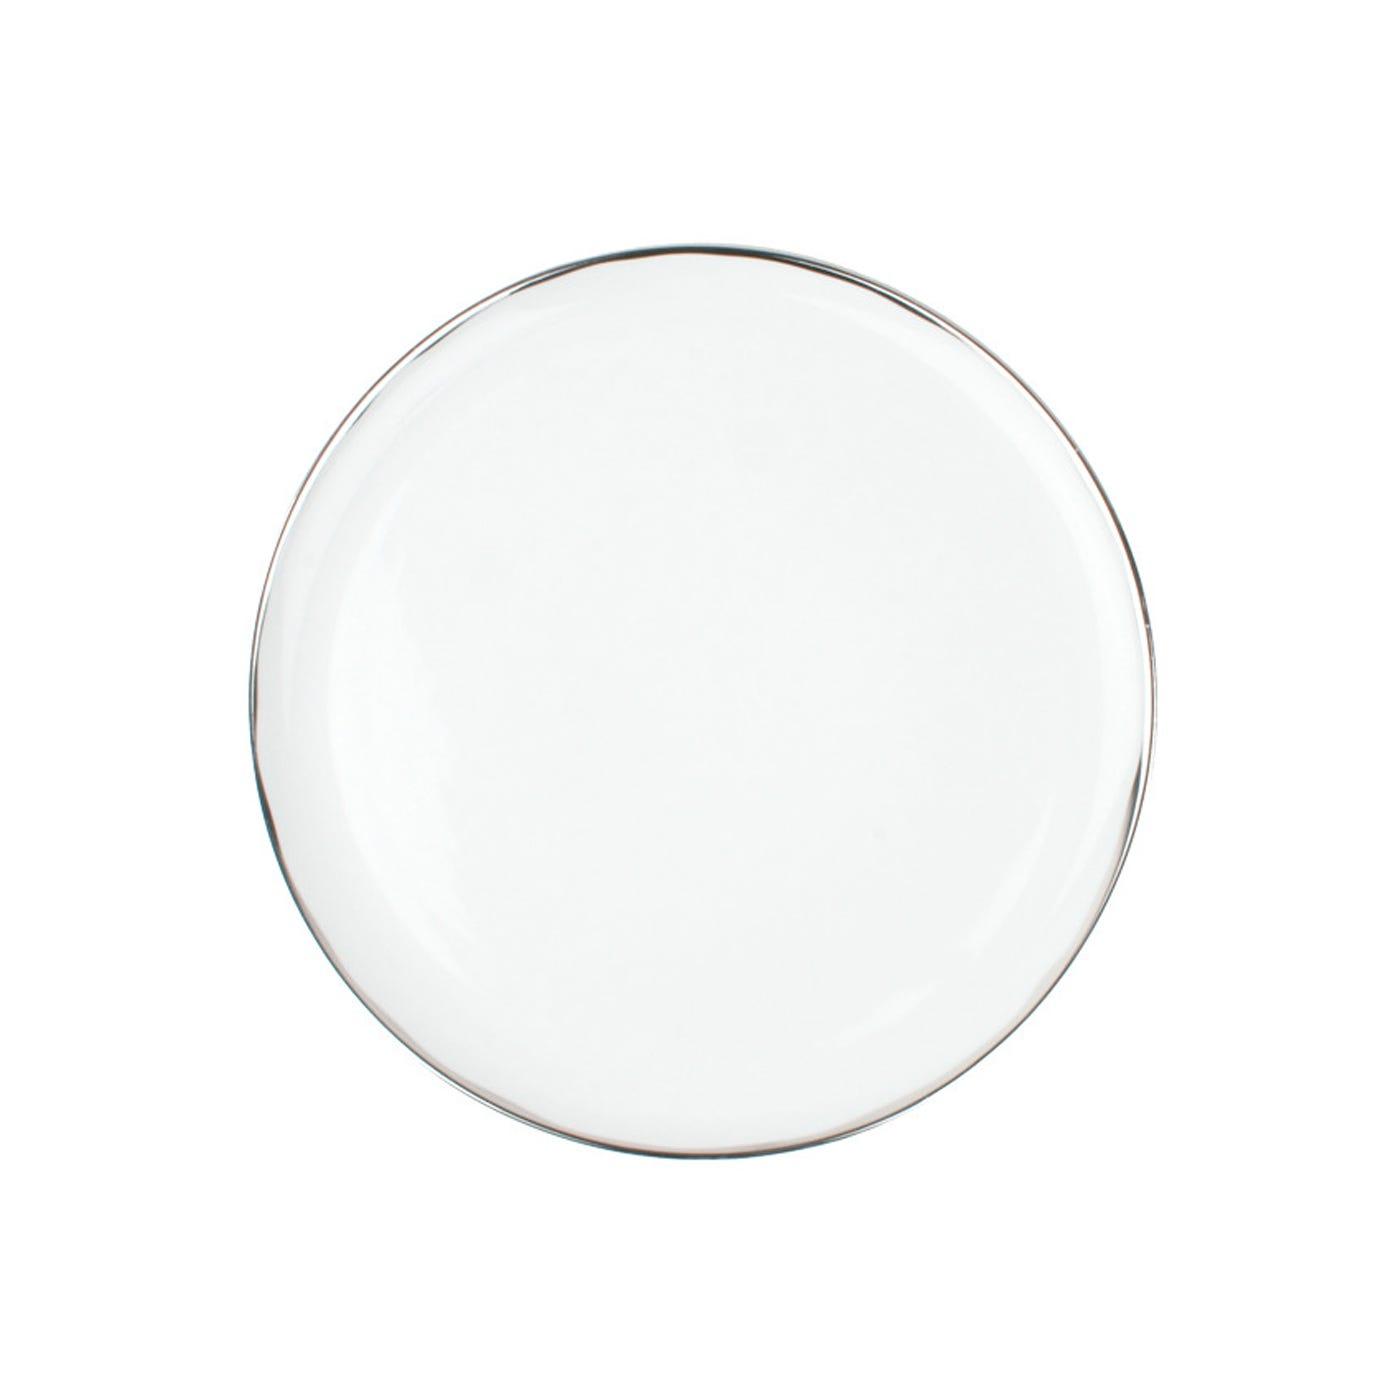 Dauville Dinner Plate Platinum